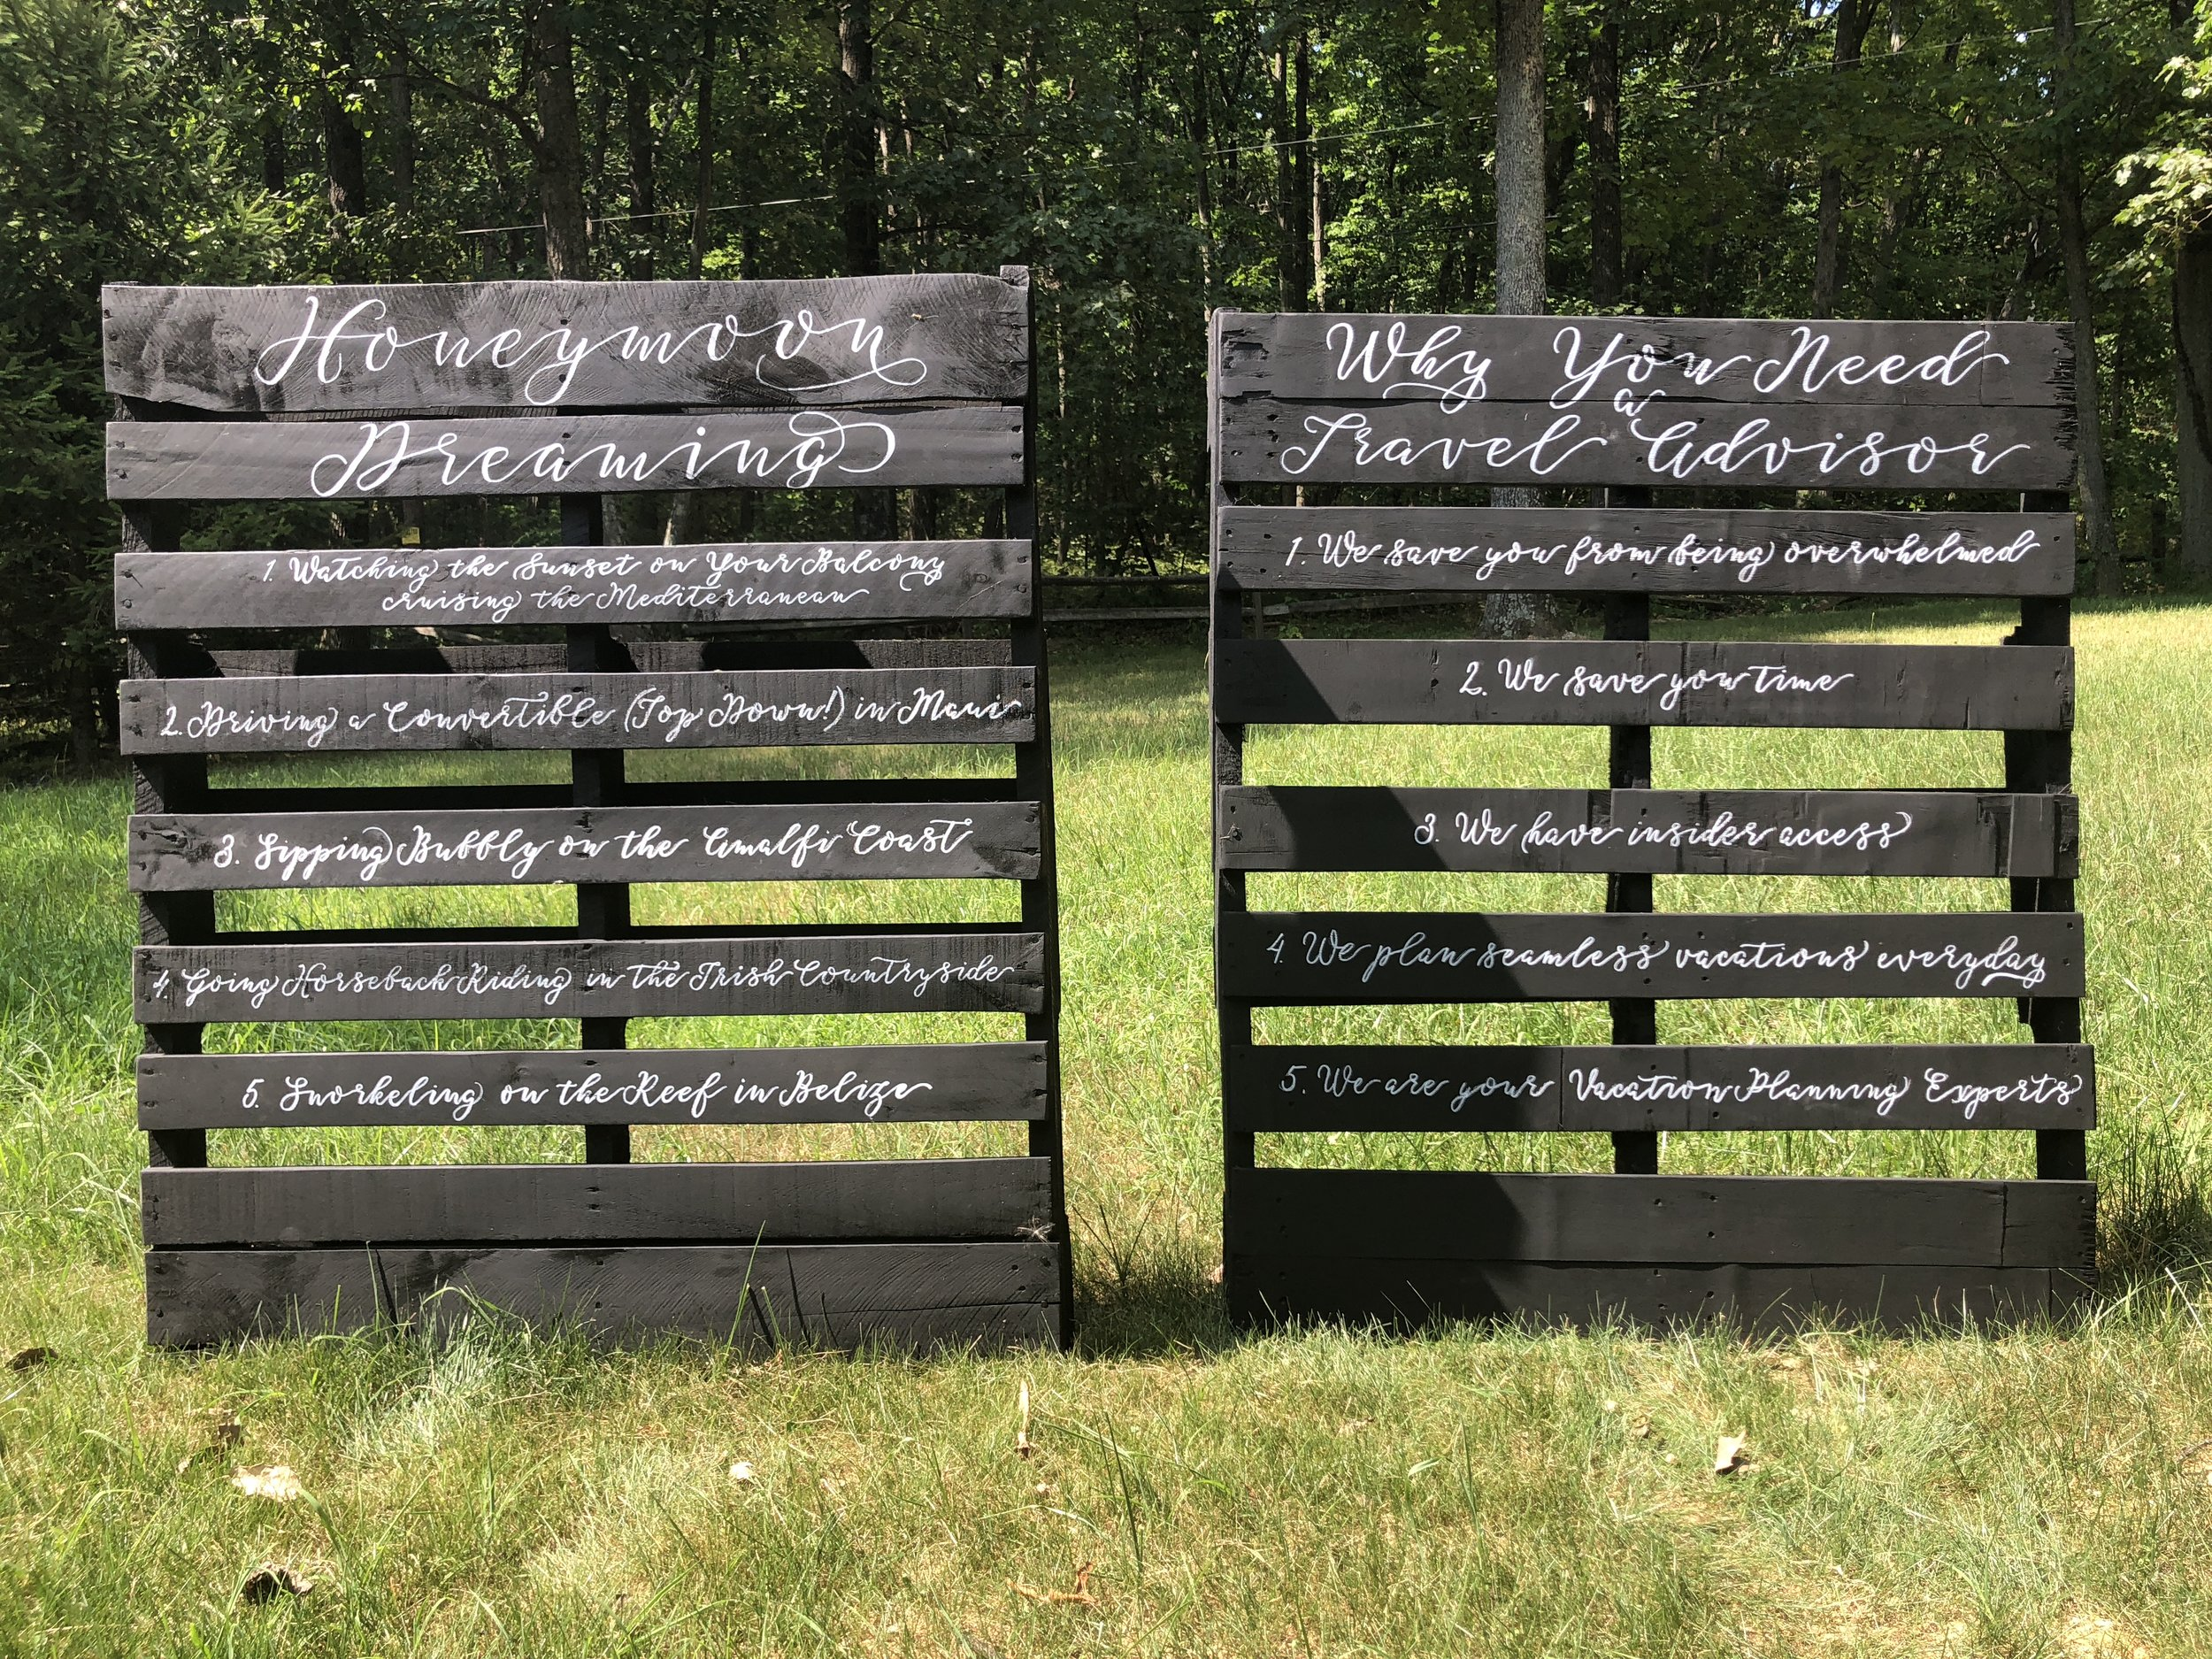 Central PA, York PA, JesSmith Designs, custom, wedding, invitations, bridal, Harrisburg, hanover, calligraphy, baltimore, wedding invitations, lancaster, gettysburg, 07-16 15.49.05.jpg